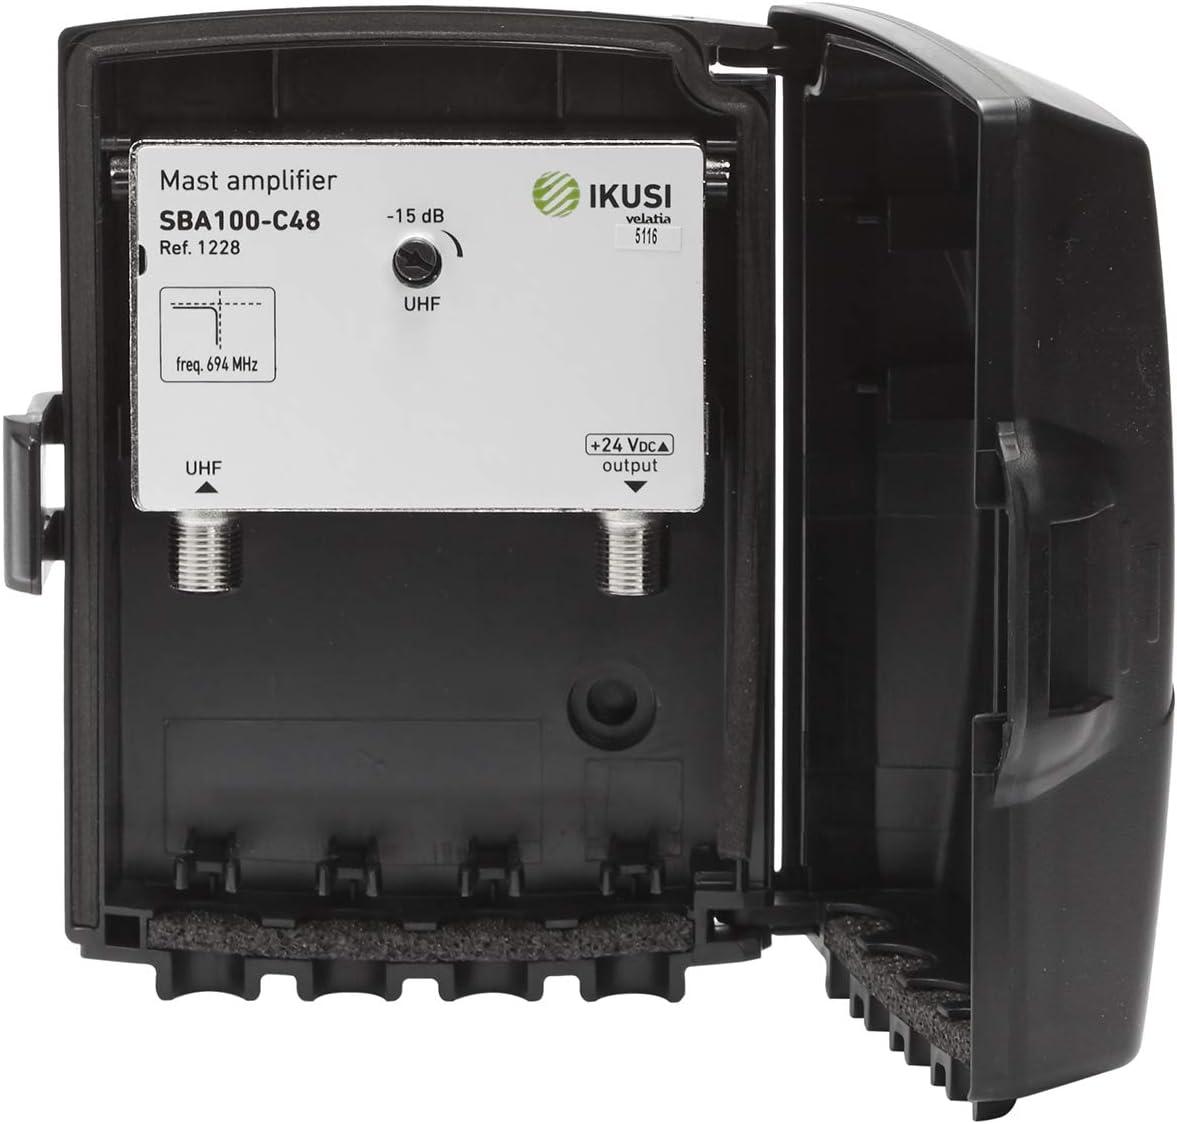 Amplificador IKUSI SBA100-C48 5G